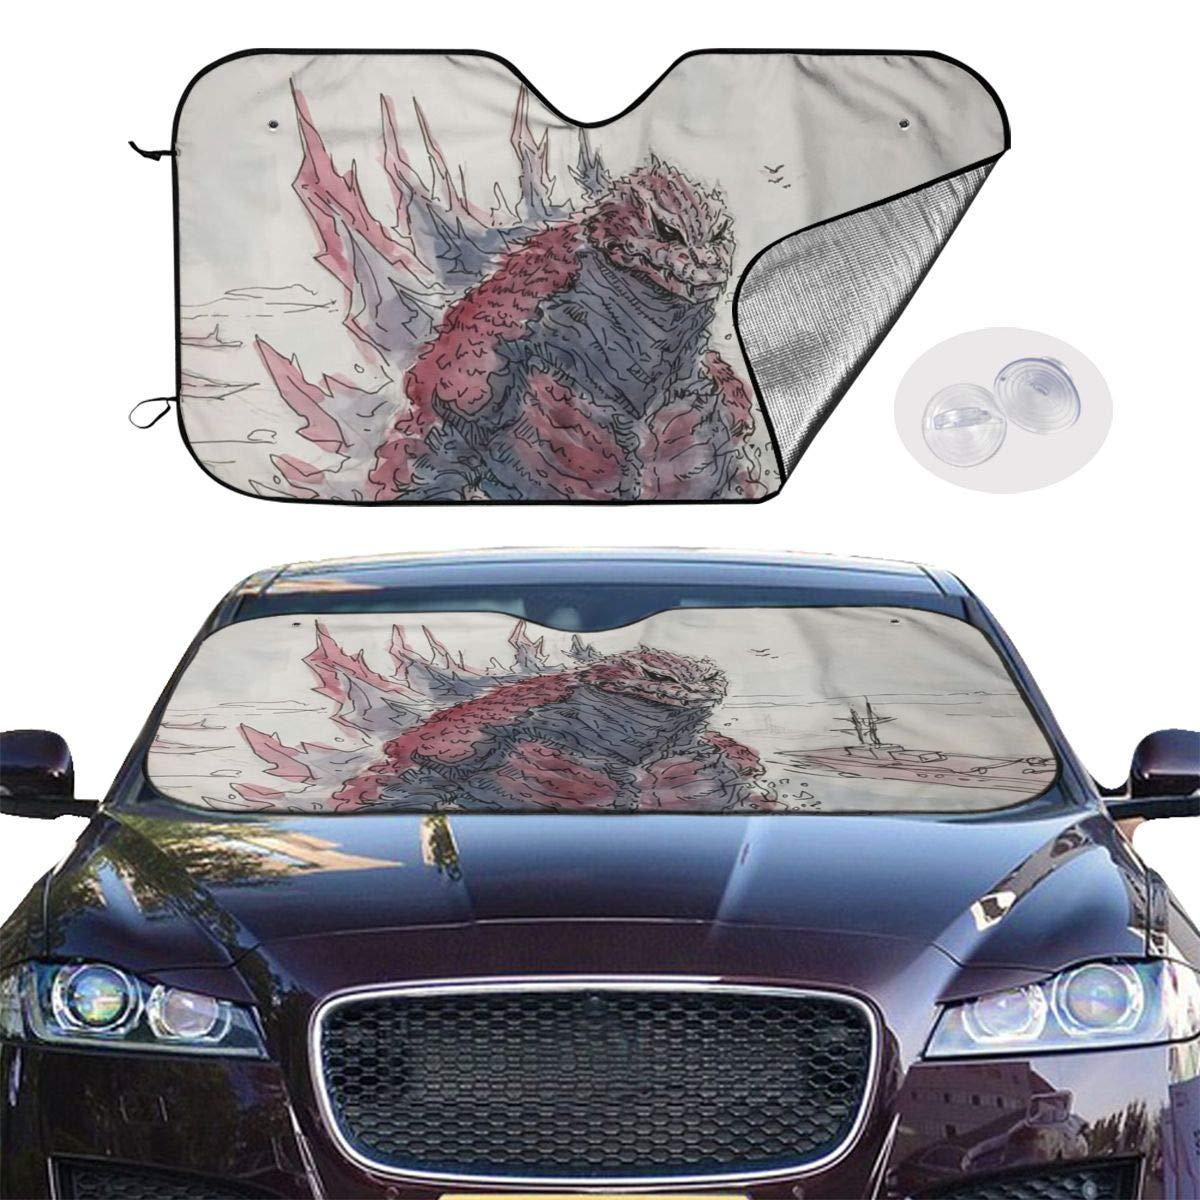 51 X 27.5 Bargburm Angry Colorful Lion Windshield Sunshade for Car SUV Truck Foldable Uv Ray Reflector Front Window Sun Shade Visor Shield Cover